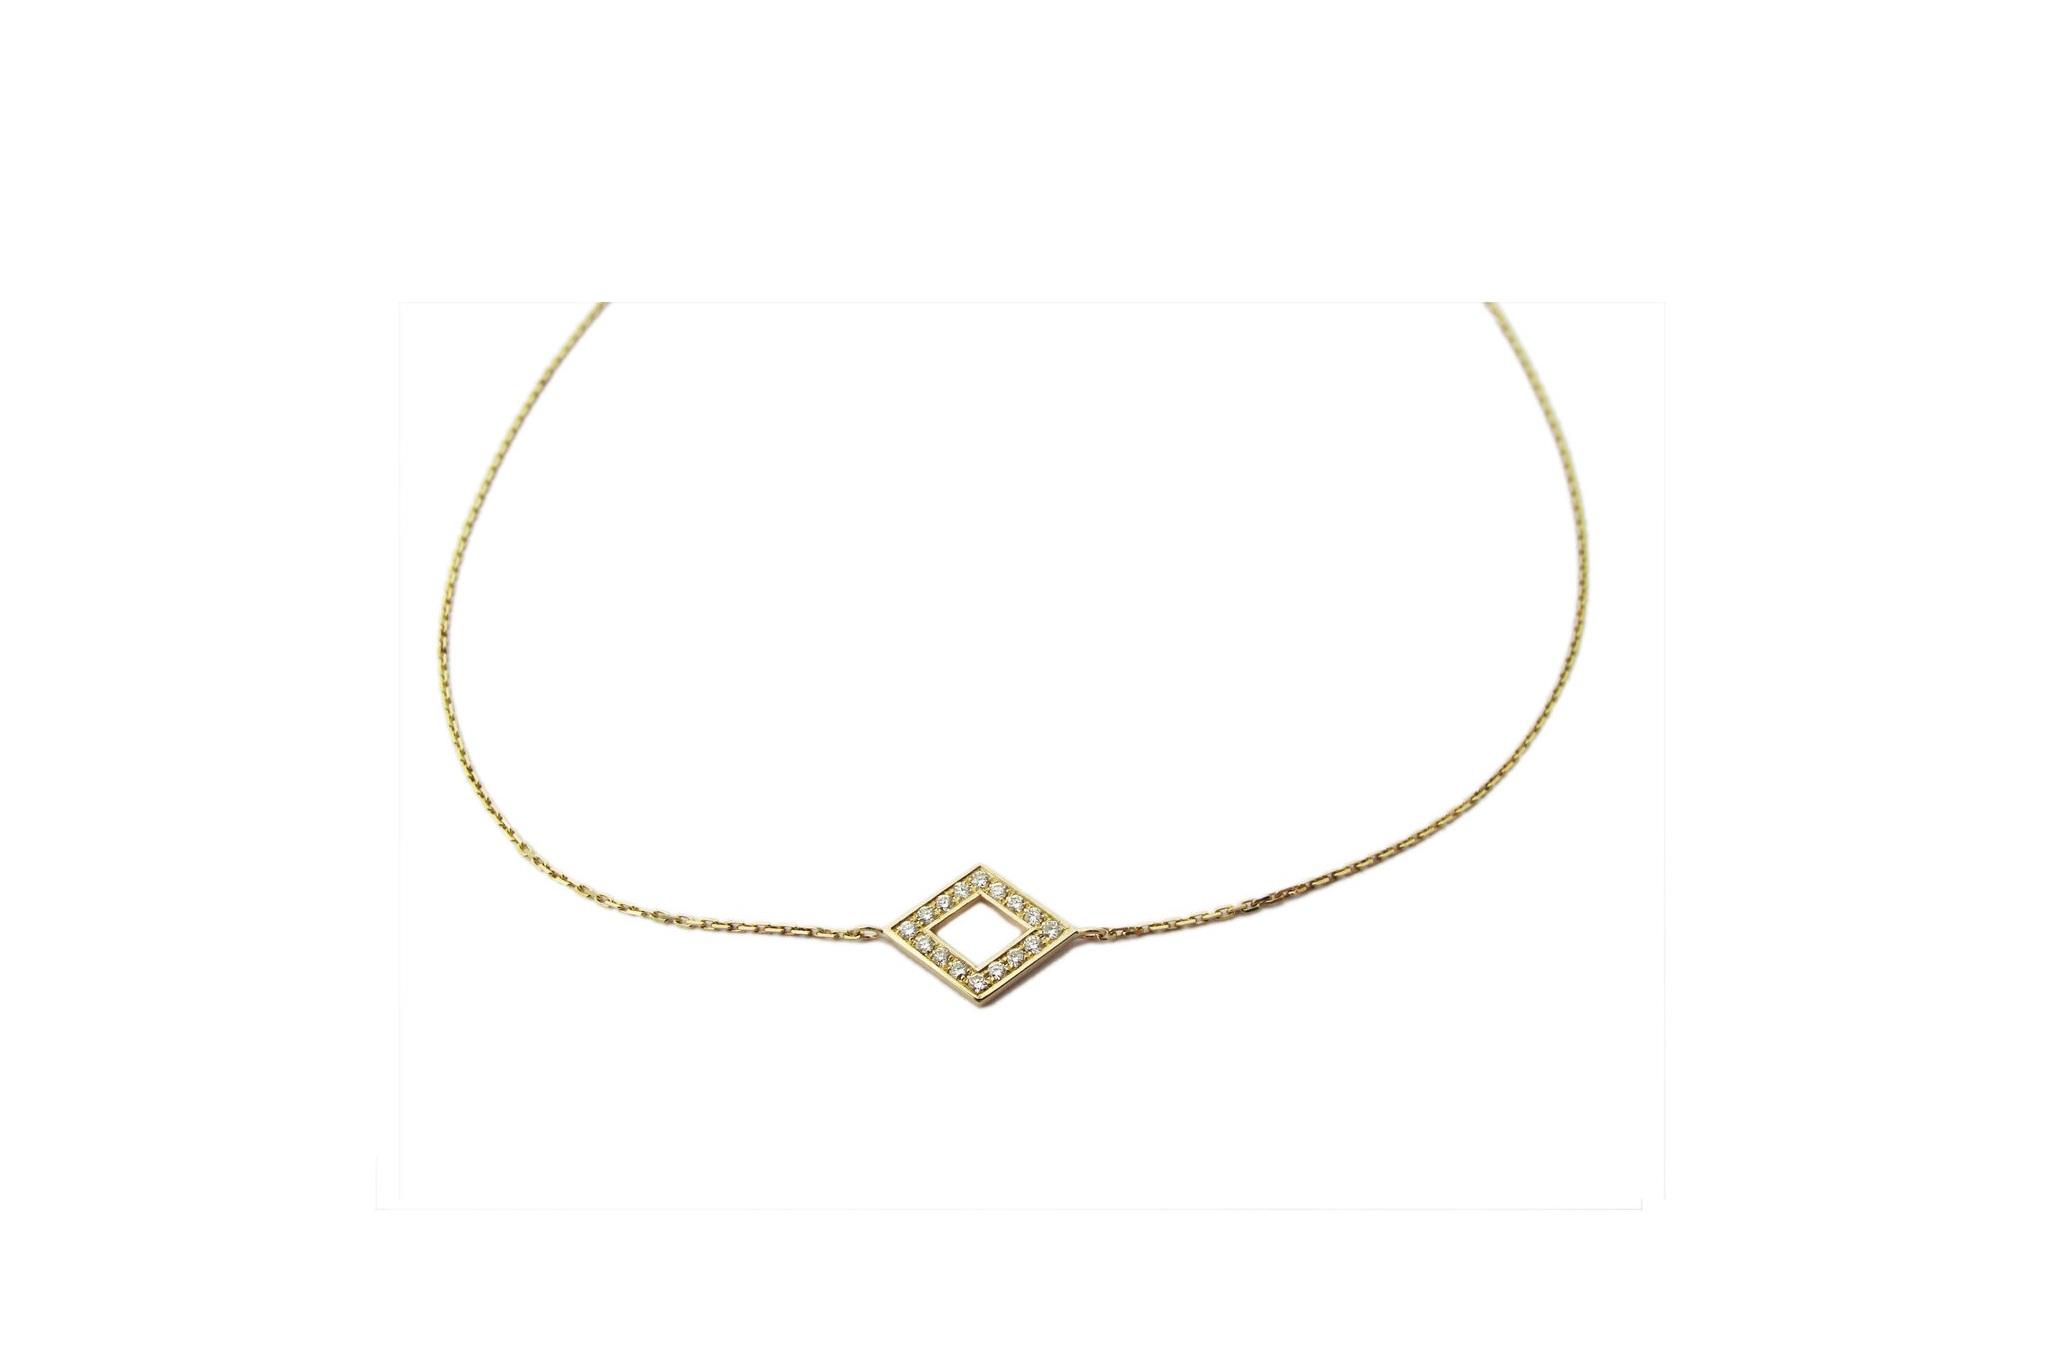 MICRO PAVE + GOLD DIAMOND NECKLACE